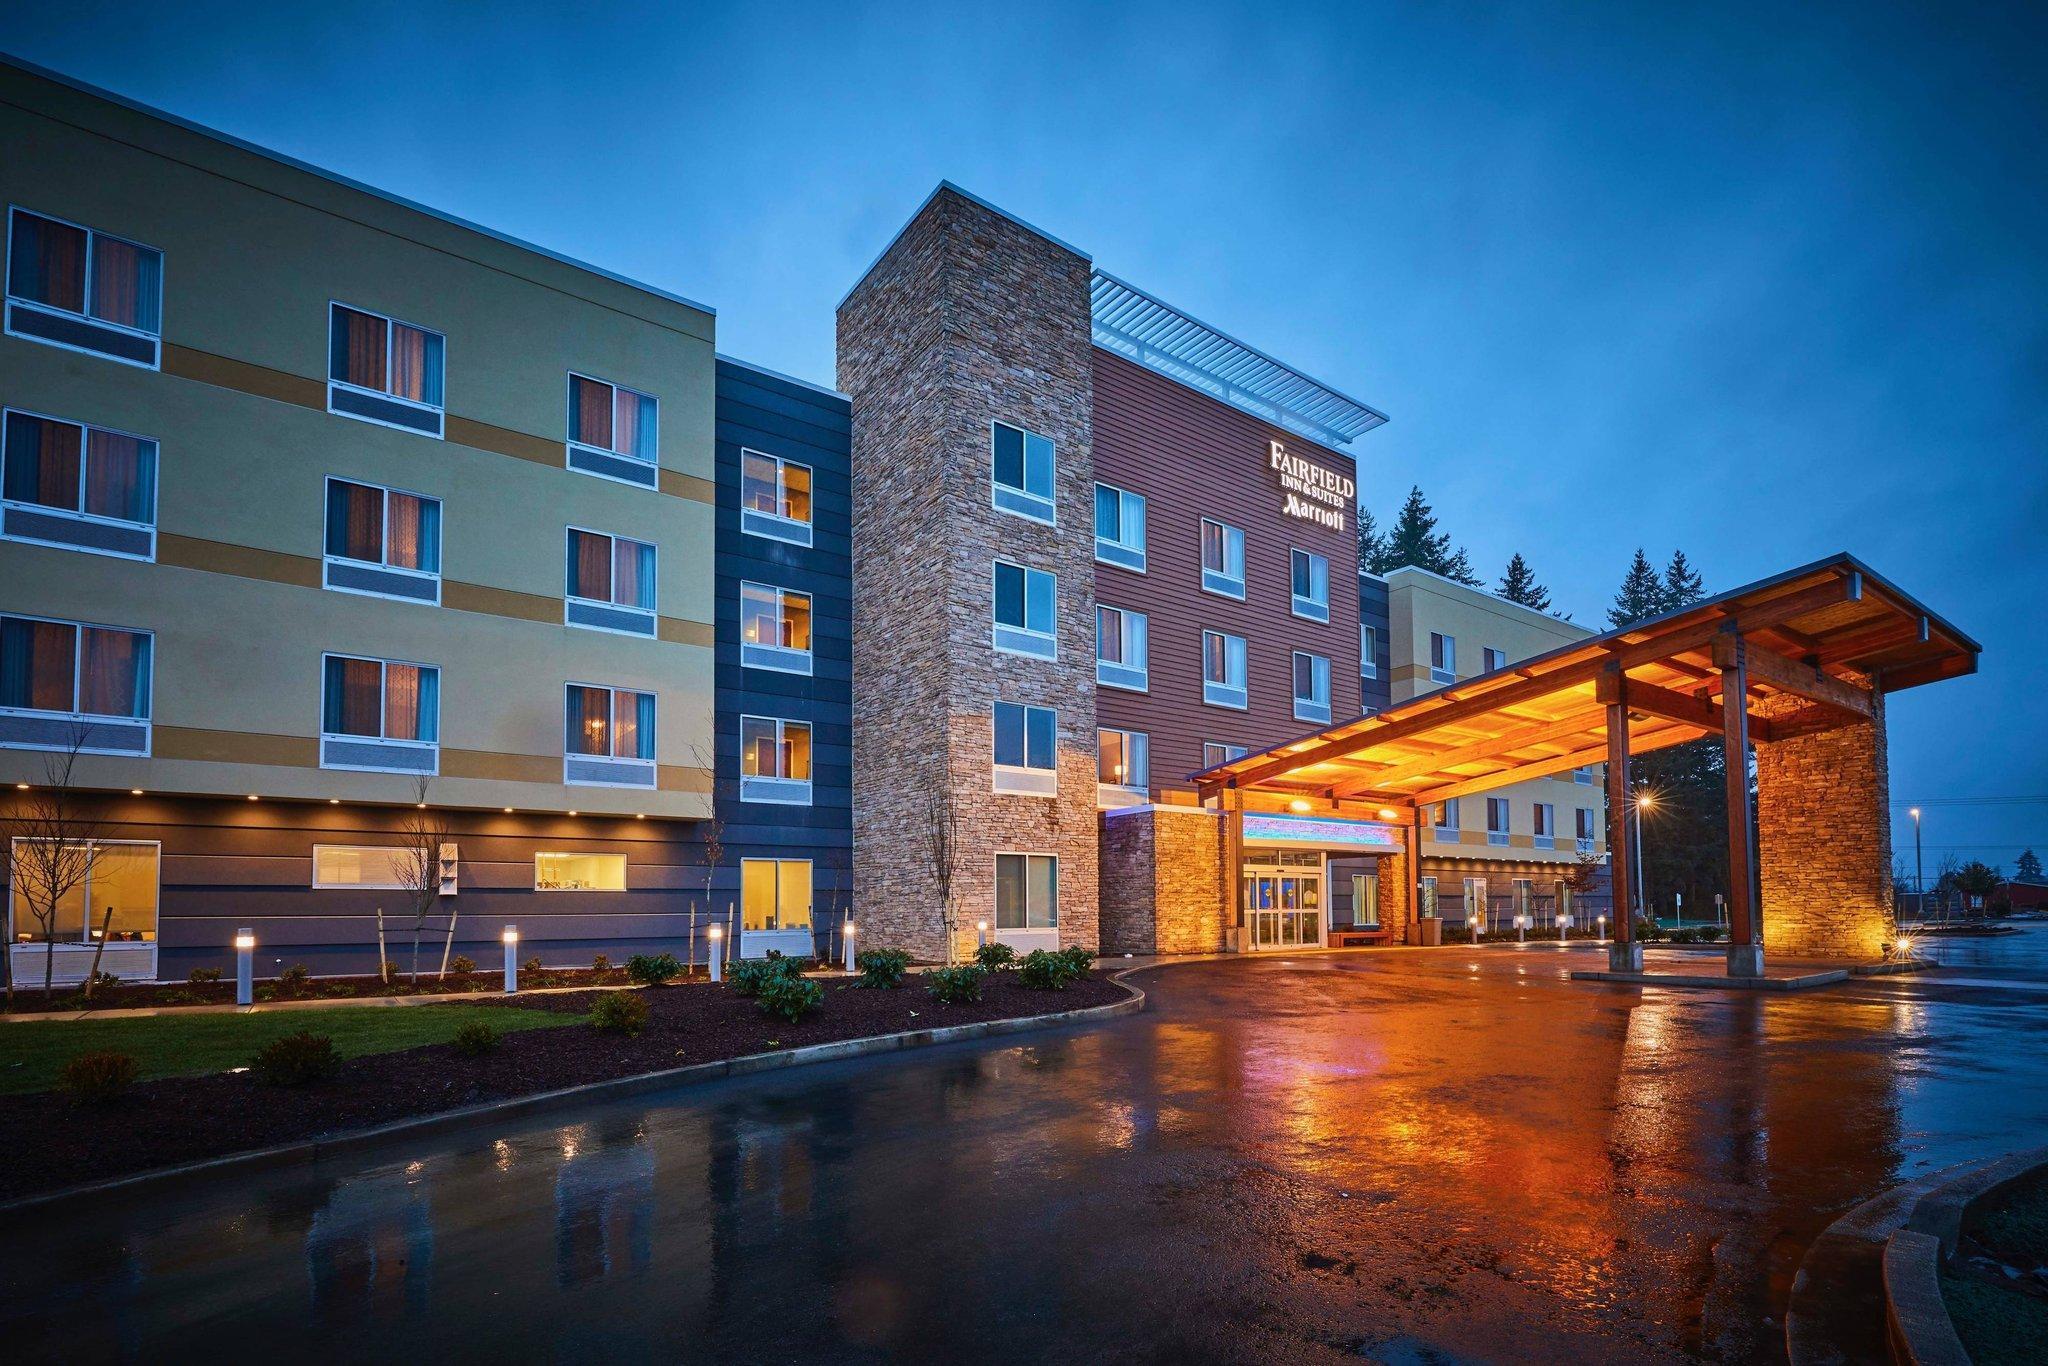 Fairfield Inn & Suites Grand Mound Centralia